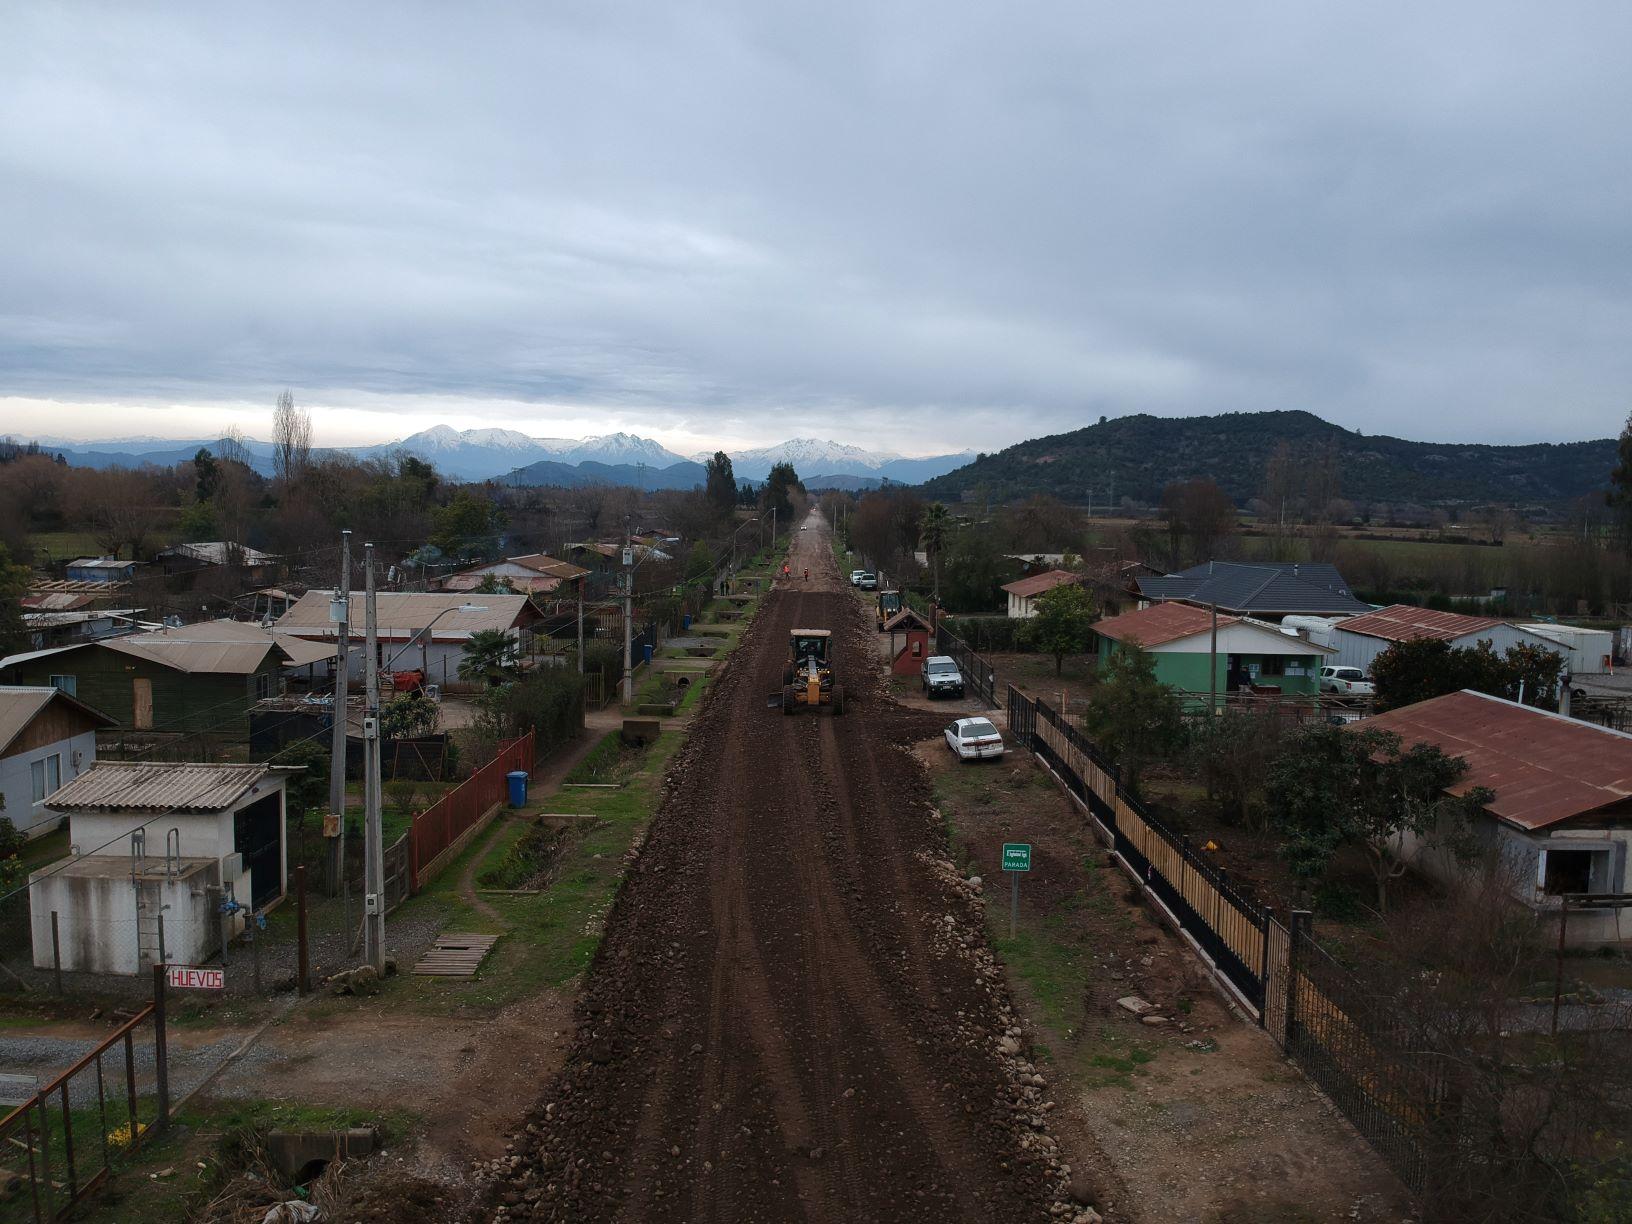 Avanzan obras de pavimentación de caminos rurales de San Clemente